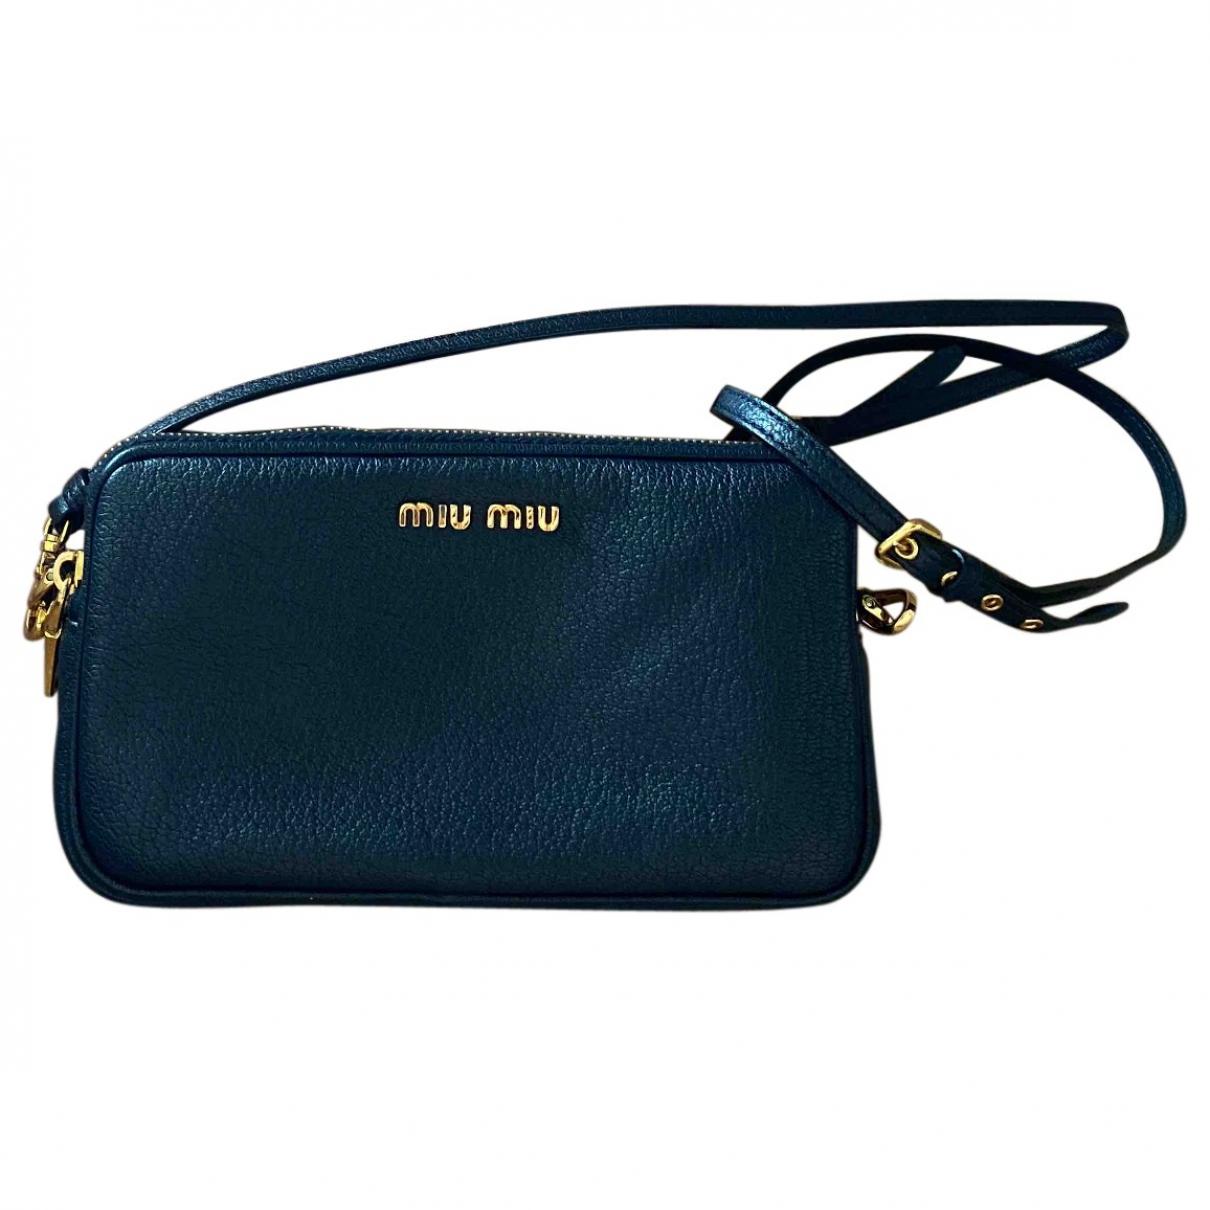 Miu Miu \N Handtasche in  Marine Leder